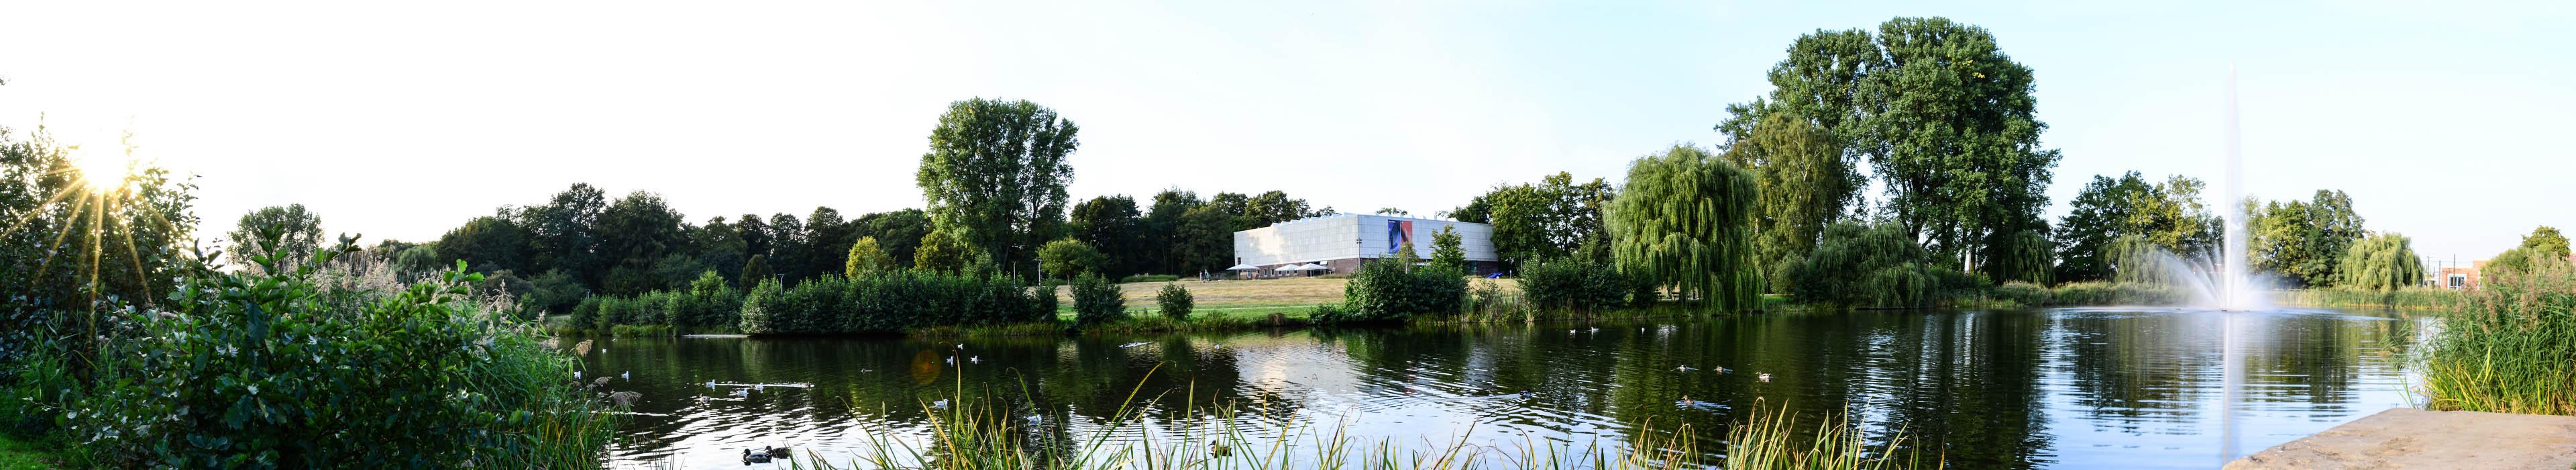 Rostock - Kunsthalle